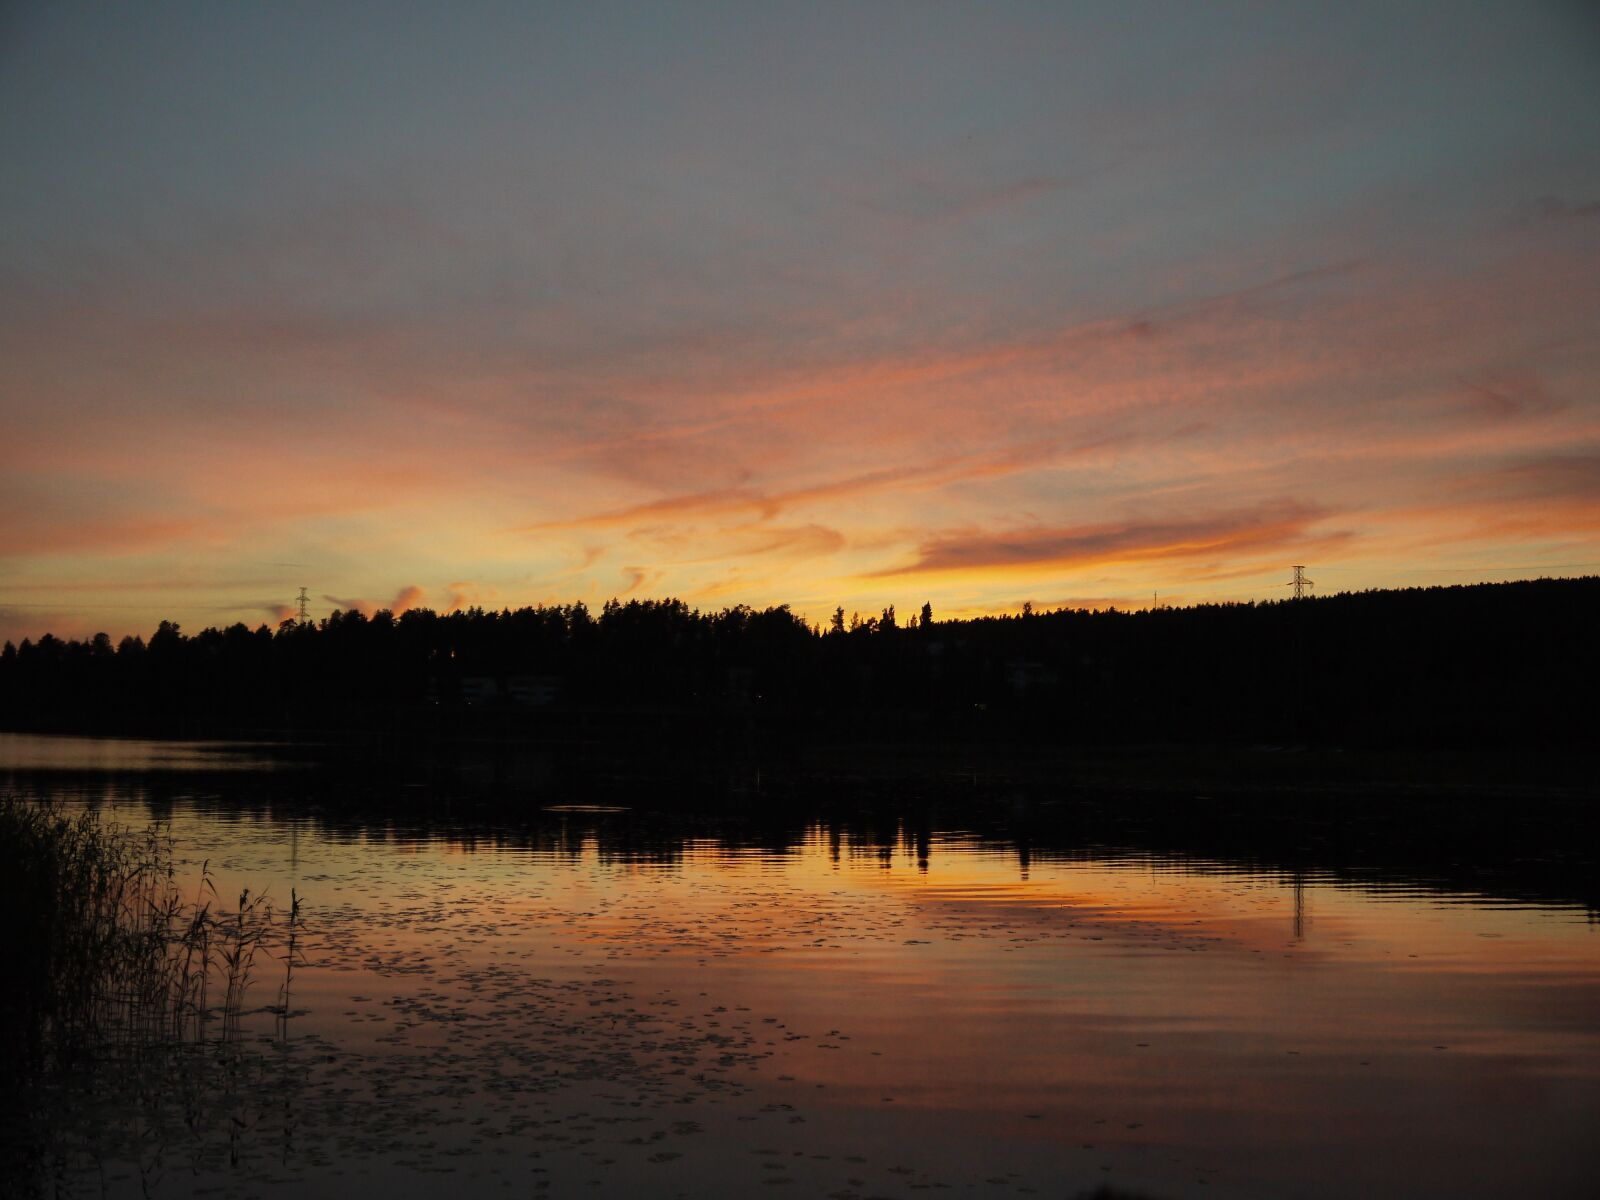 sunset, landscape, trees